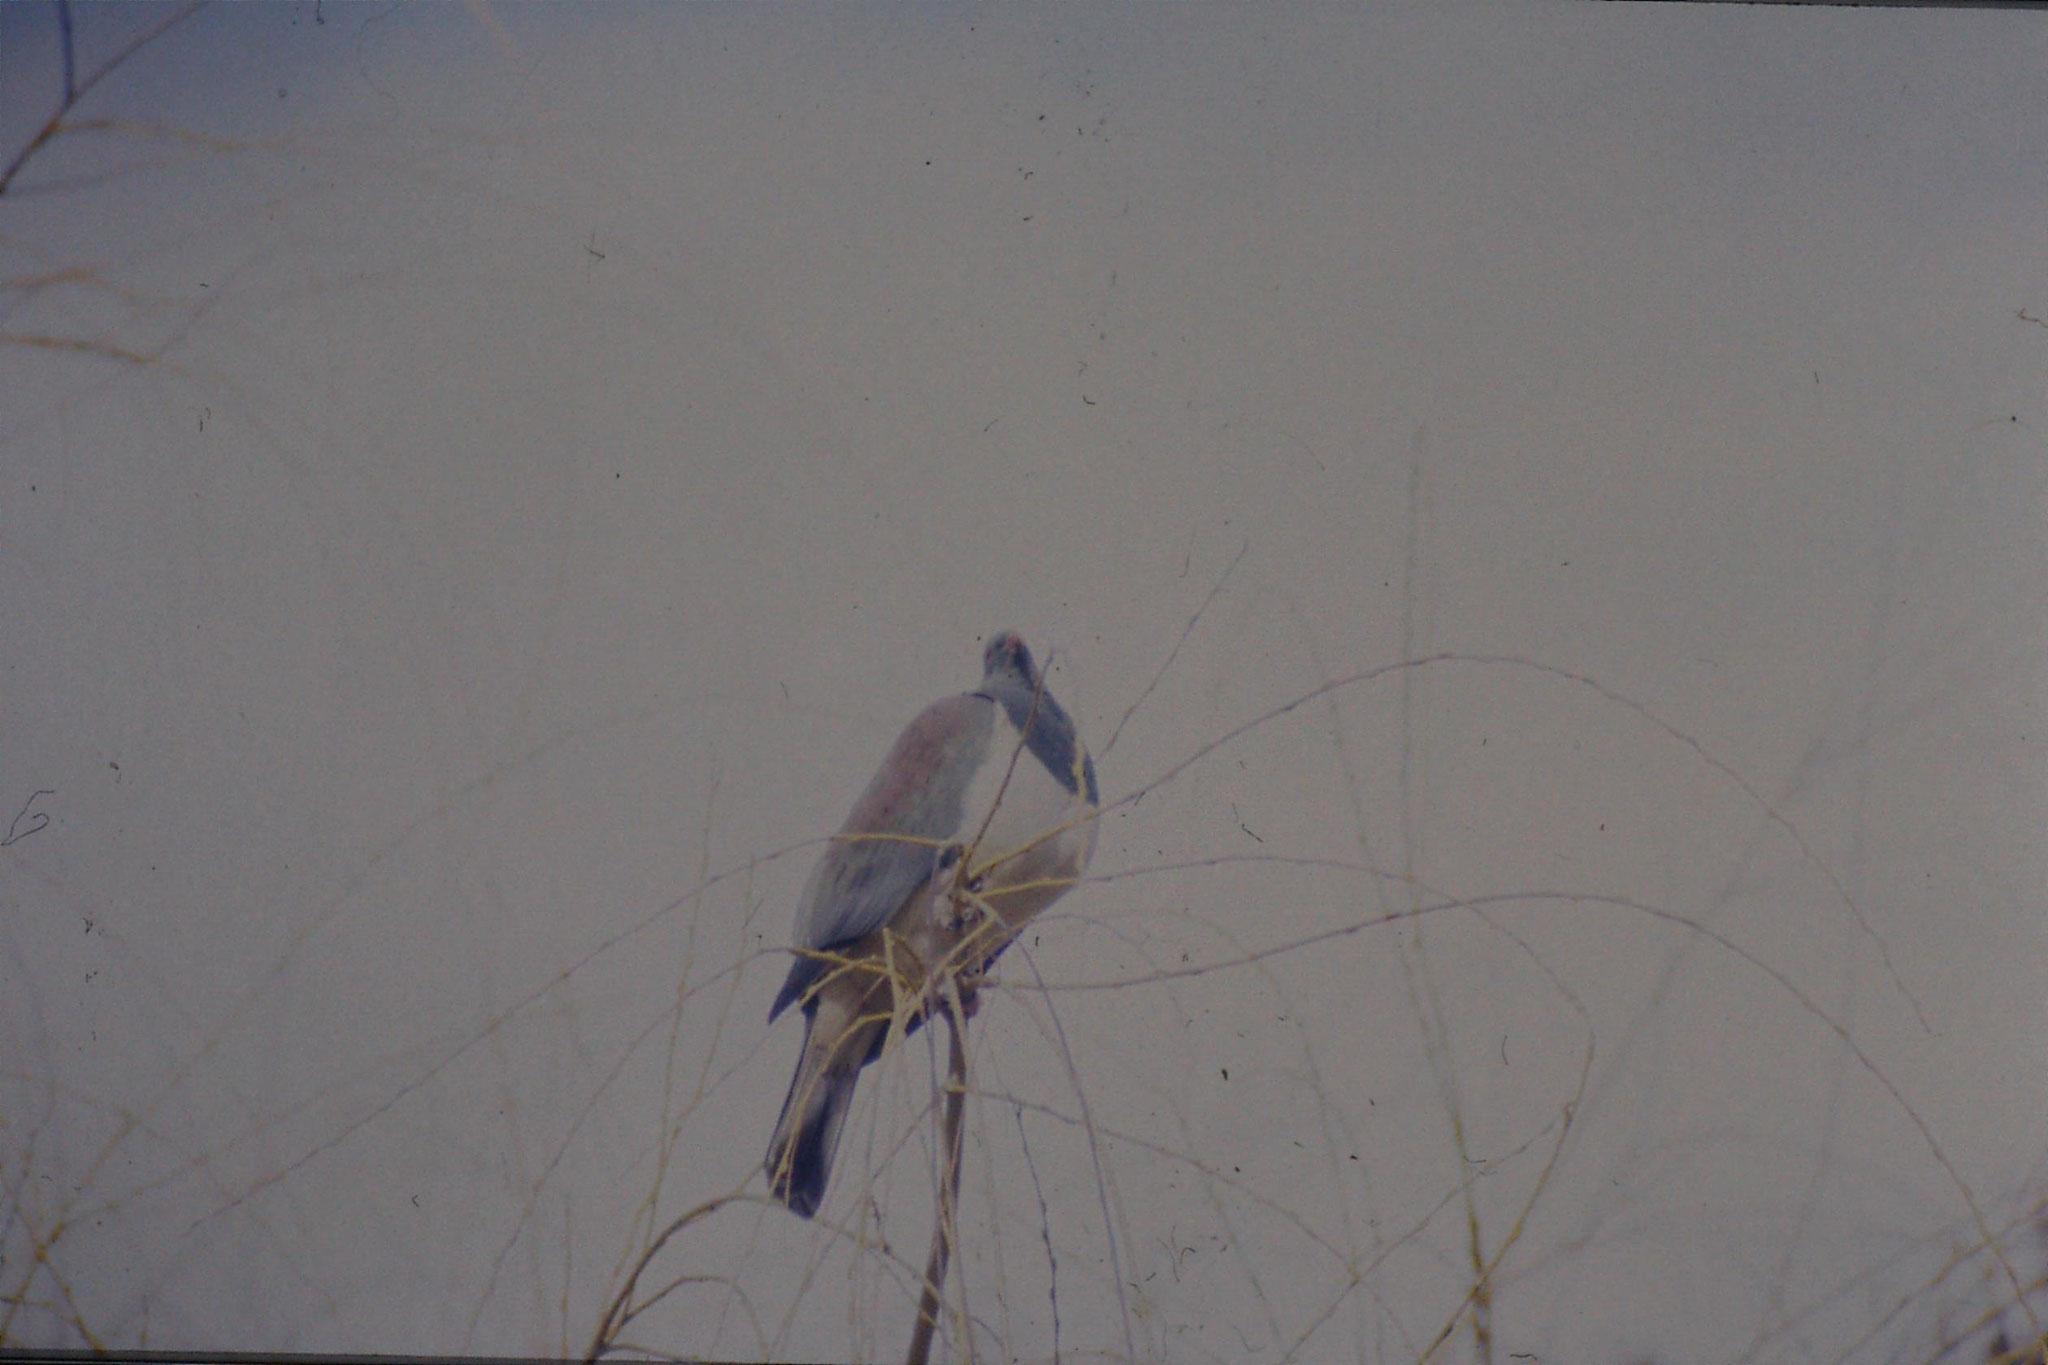 12/8/1990: 21: New Zealand pigeon